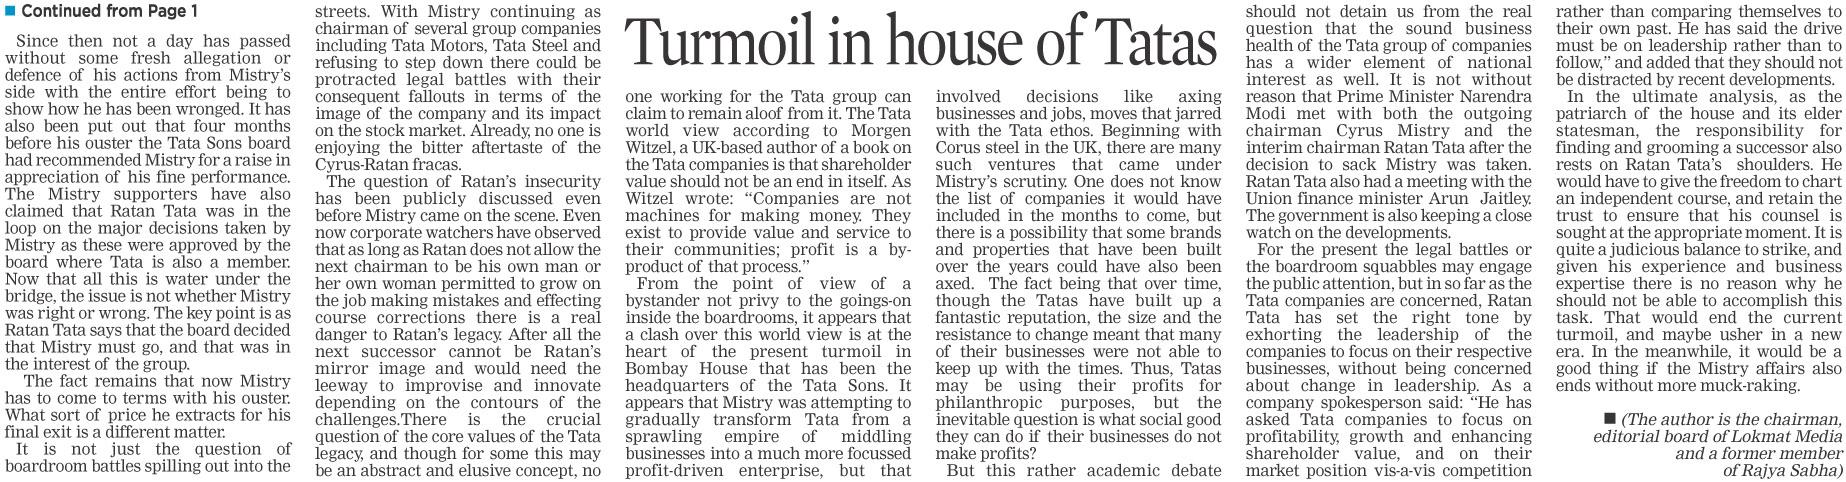 Turmoil in house of Tatas